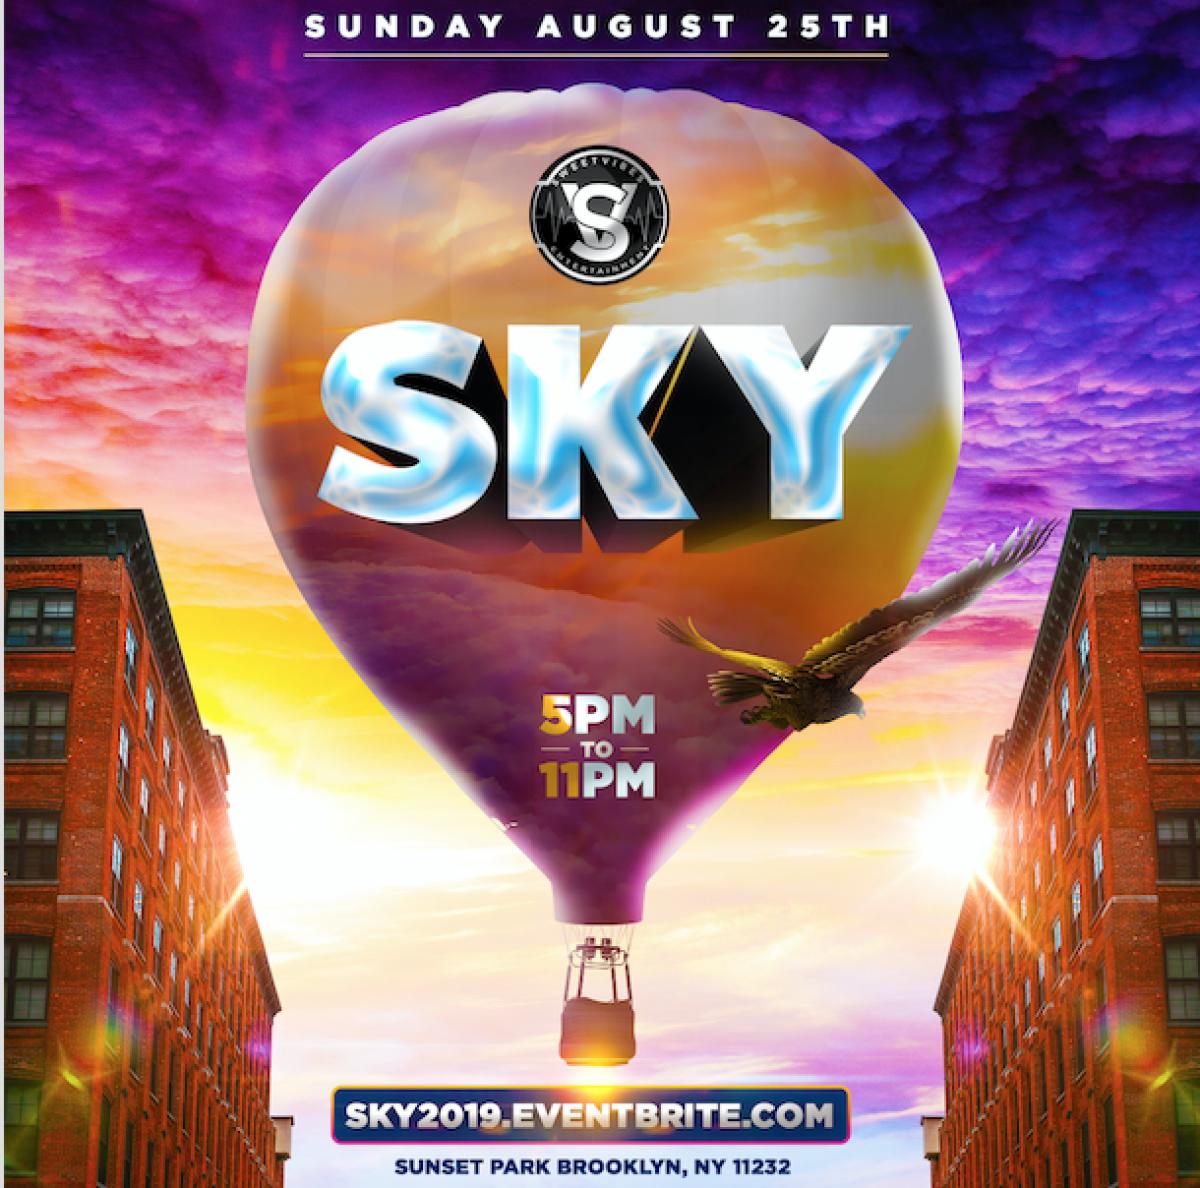 Sky Daybreak flyer or graphic.